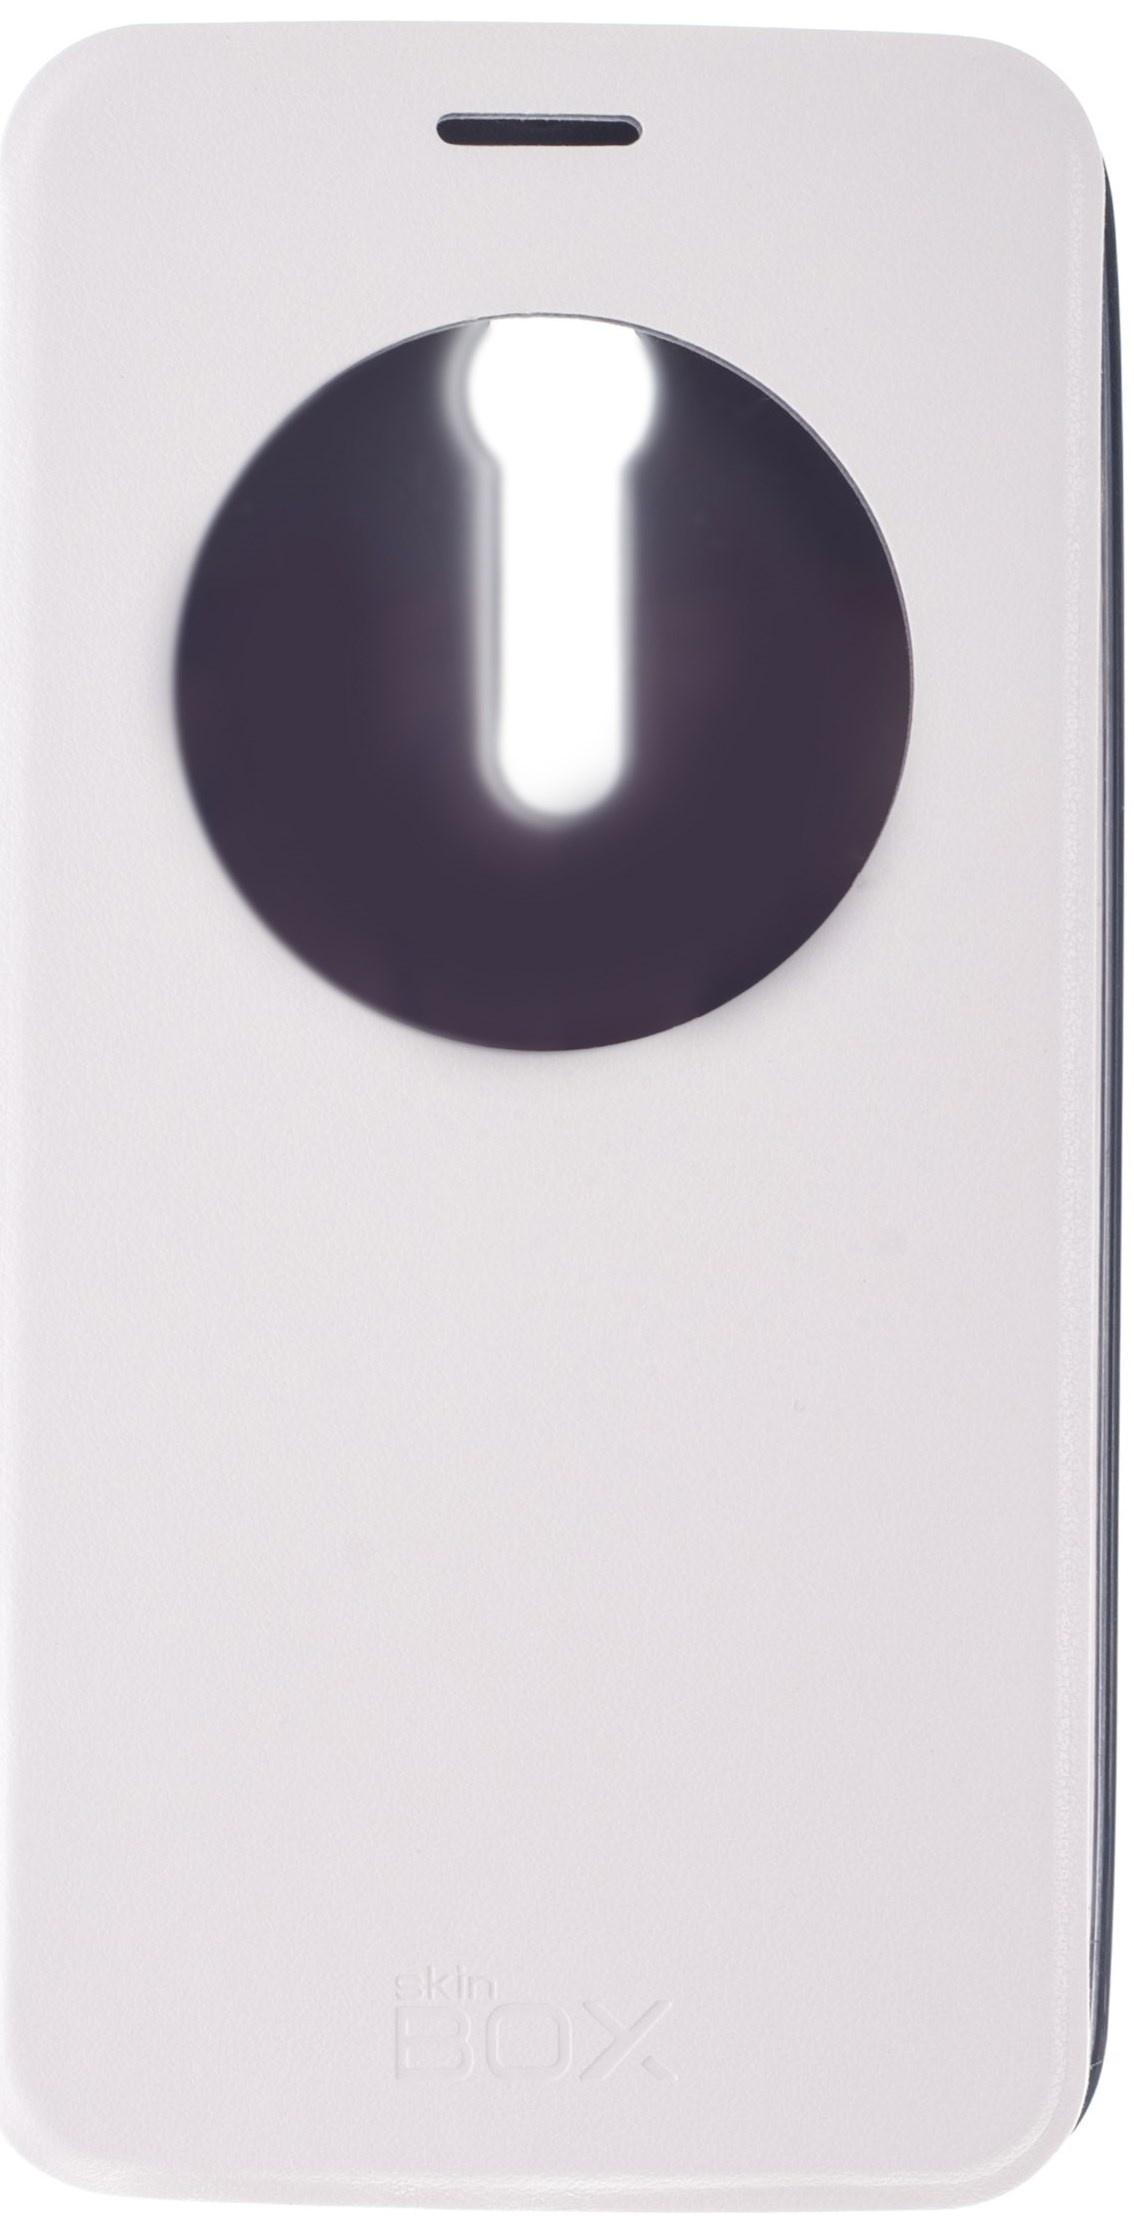 Чехол для сотового телефона skinBOX Lux AW, 4630042526891, белый roar aw чехол для asus zenfone 4 a400cg white